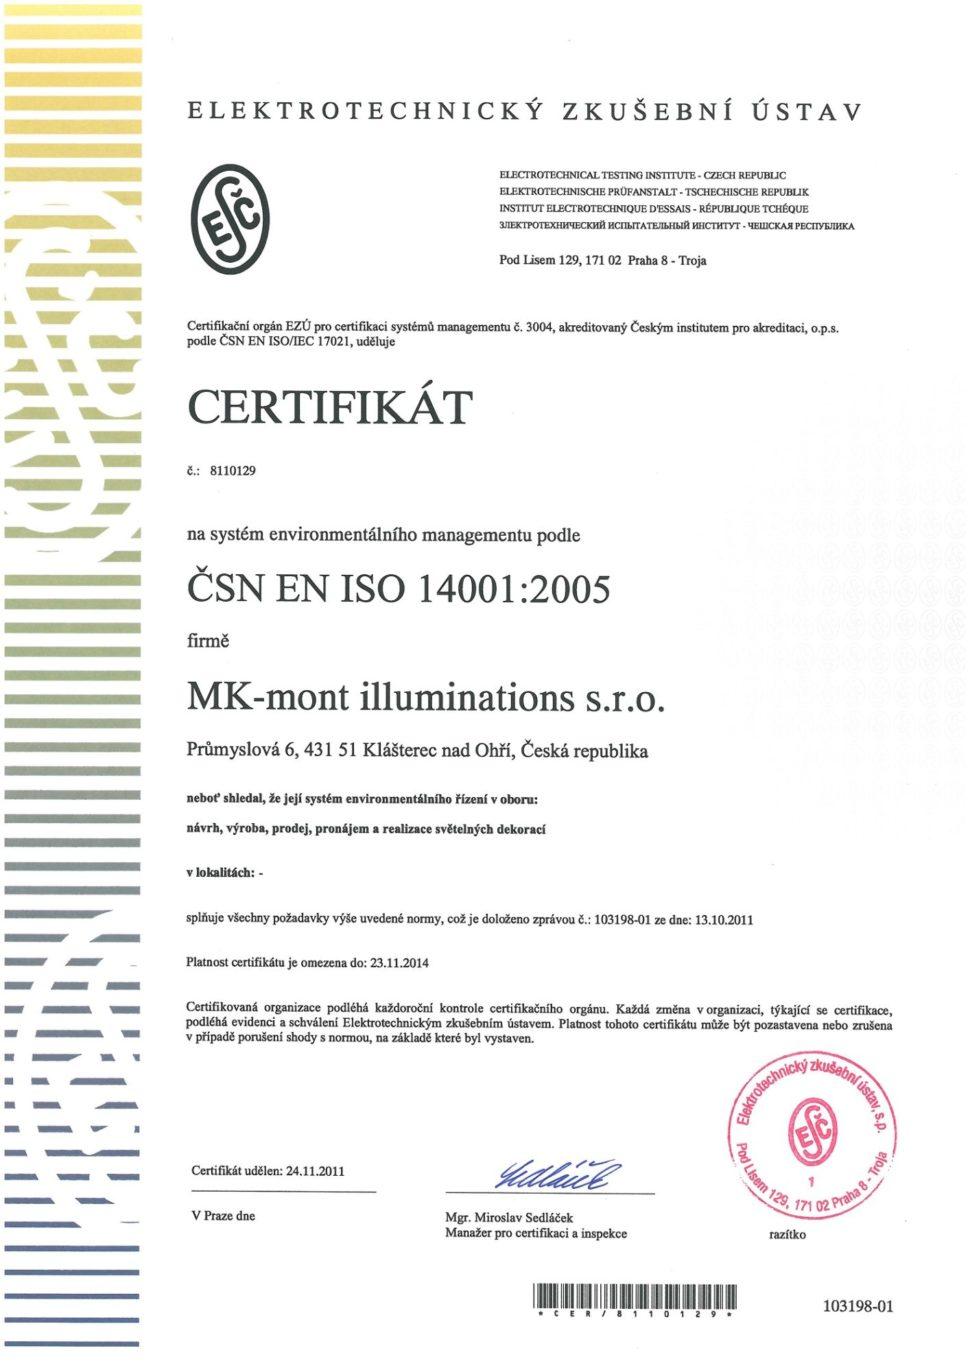 MK mont certifikát ISO 14001